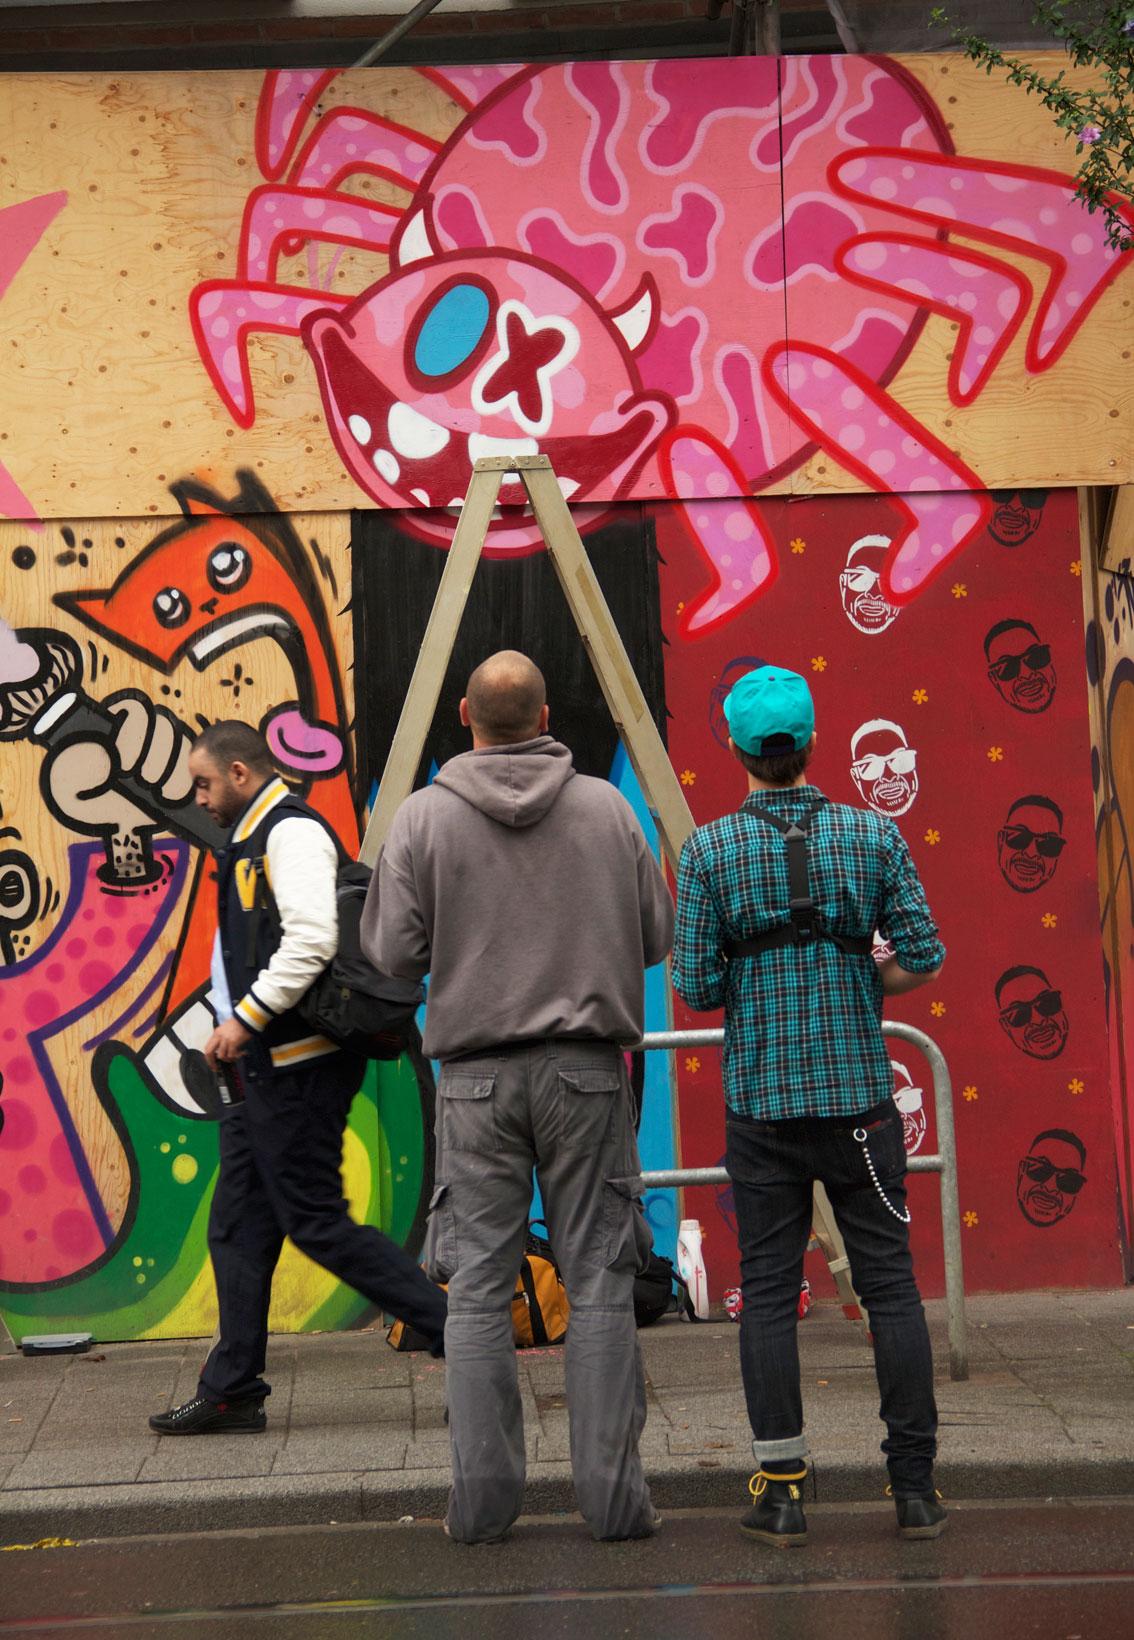 OX ALIEN + SPIDERTAG en ROTTERDAM 2013___